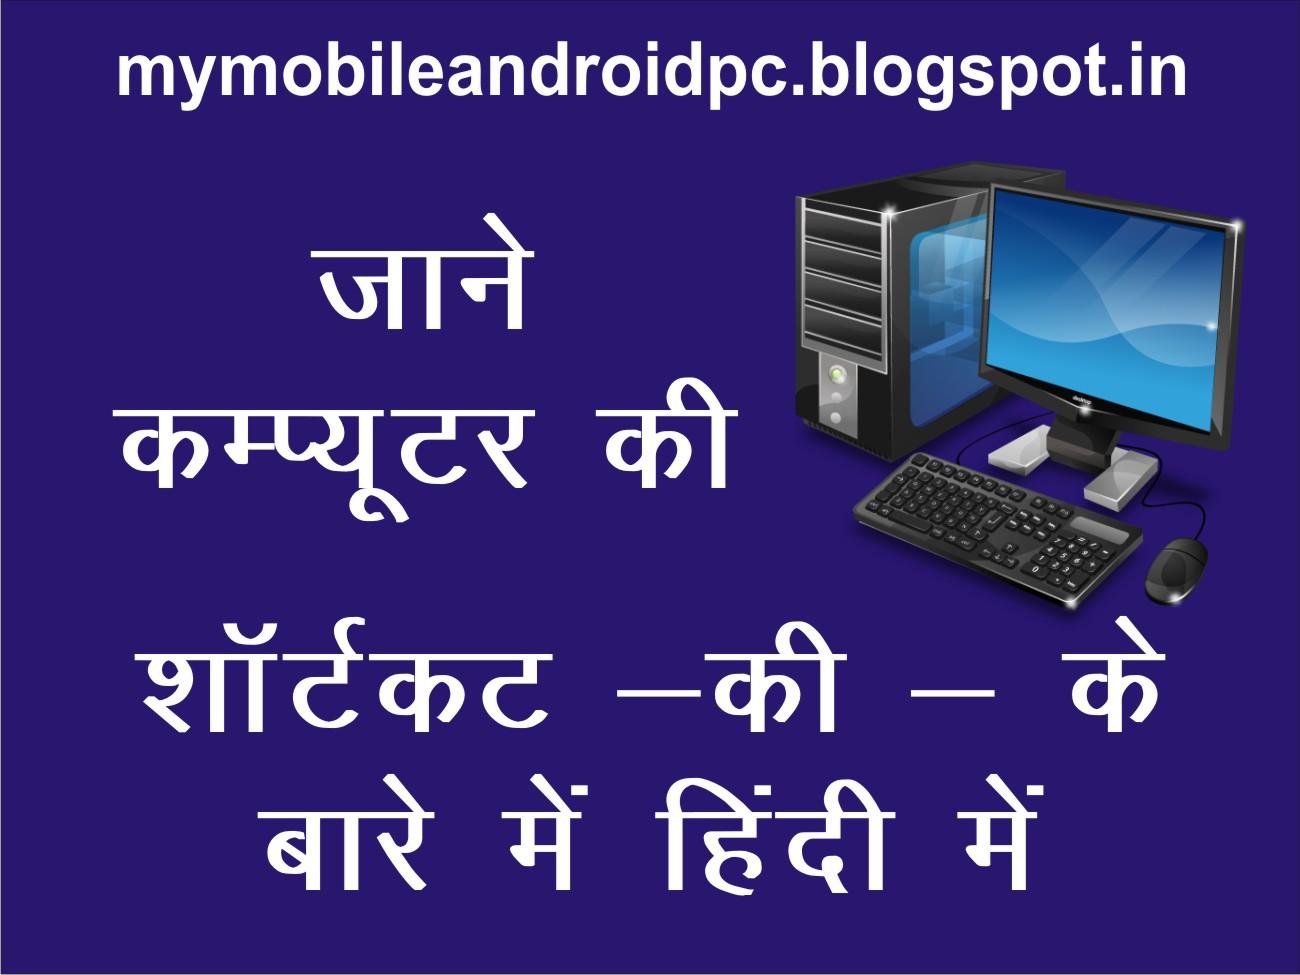 Jaane computer keyboard shortcut key ke baare me my mobile dosto main bhi jayadatar computer ke shortcut key ko hi use karta hu jisse main kafi teji se apna kaam kar pata hu to chaliye jaante hia computer ki kuch buycottarizona